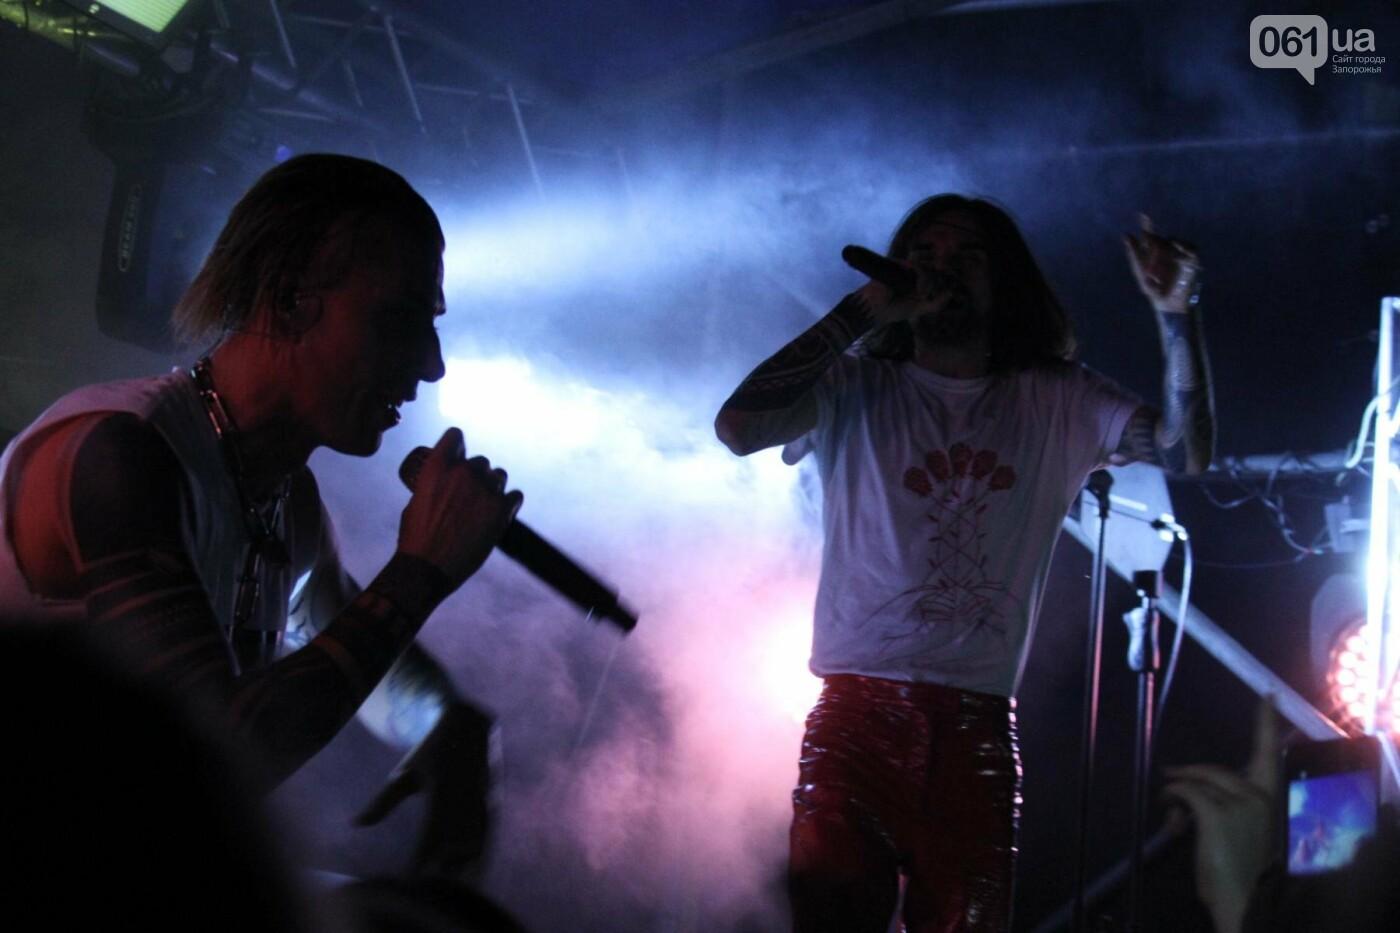 ALEKSEEV, «Агонь» и MamaRika: в Запорожье звезды устроили яркий концерт на «Miss AVRORA Summer 2018», – ФОТОРЕПОРТАЖ, фото-13